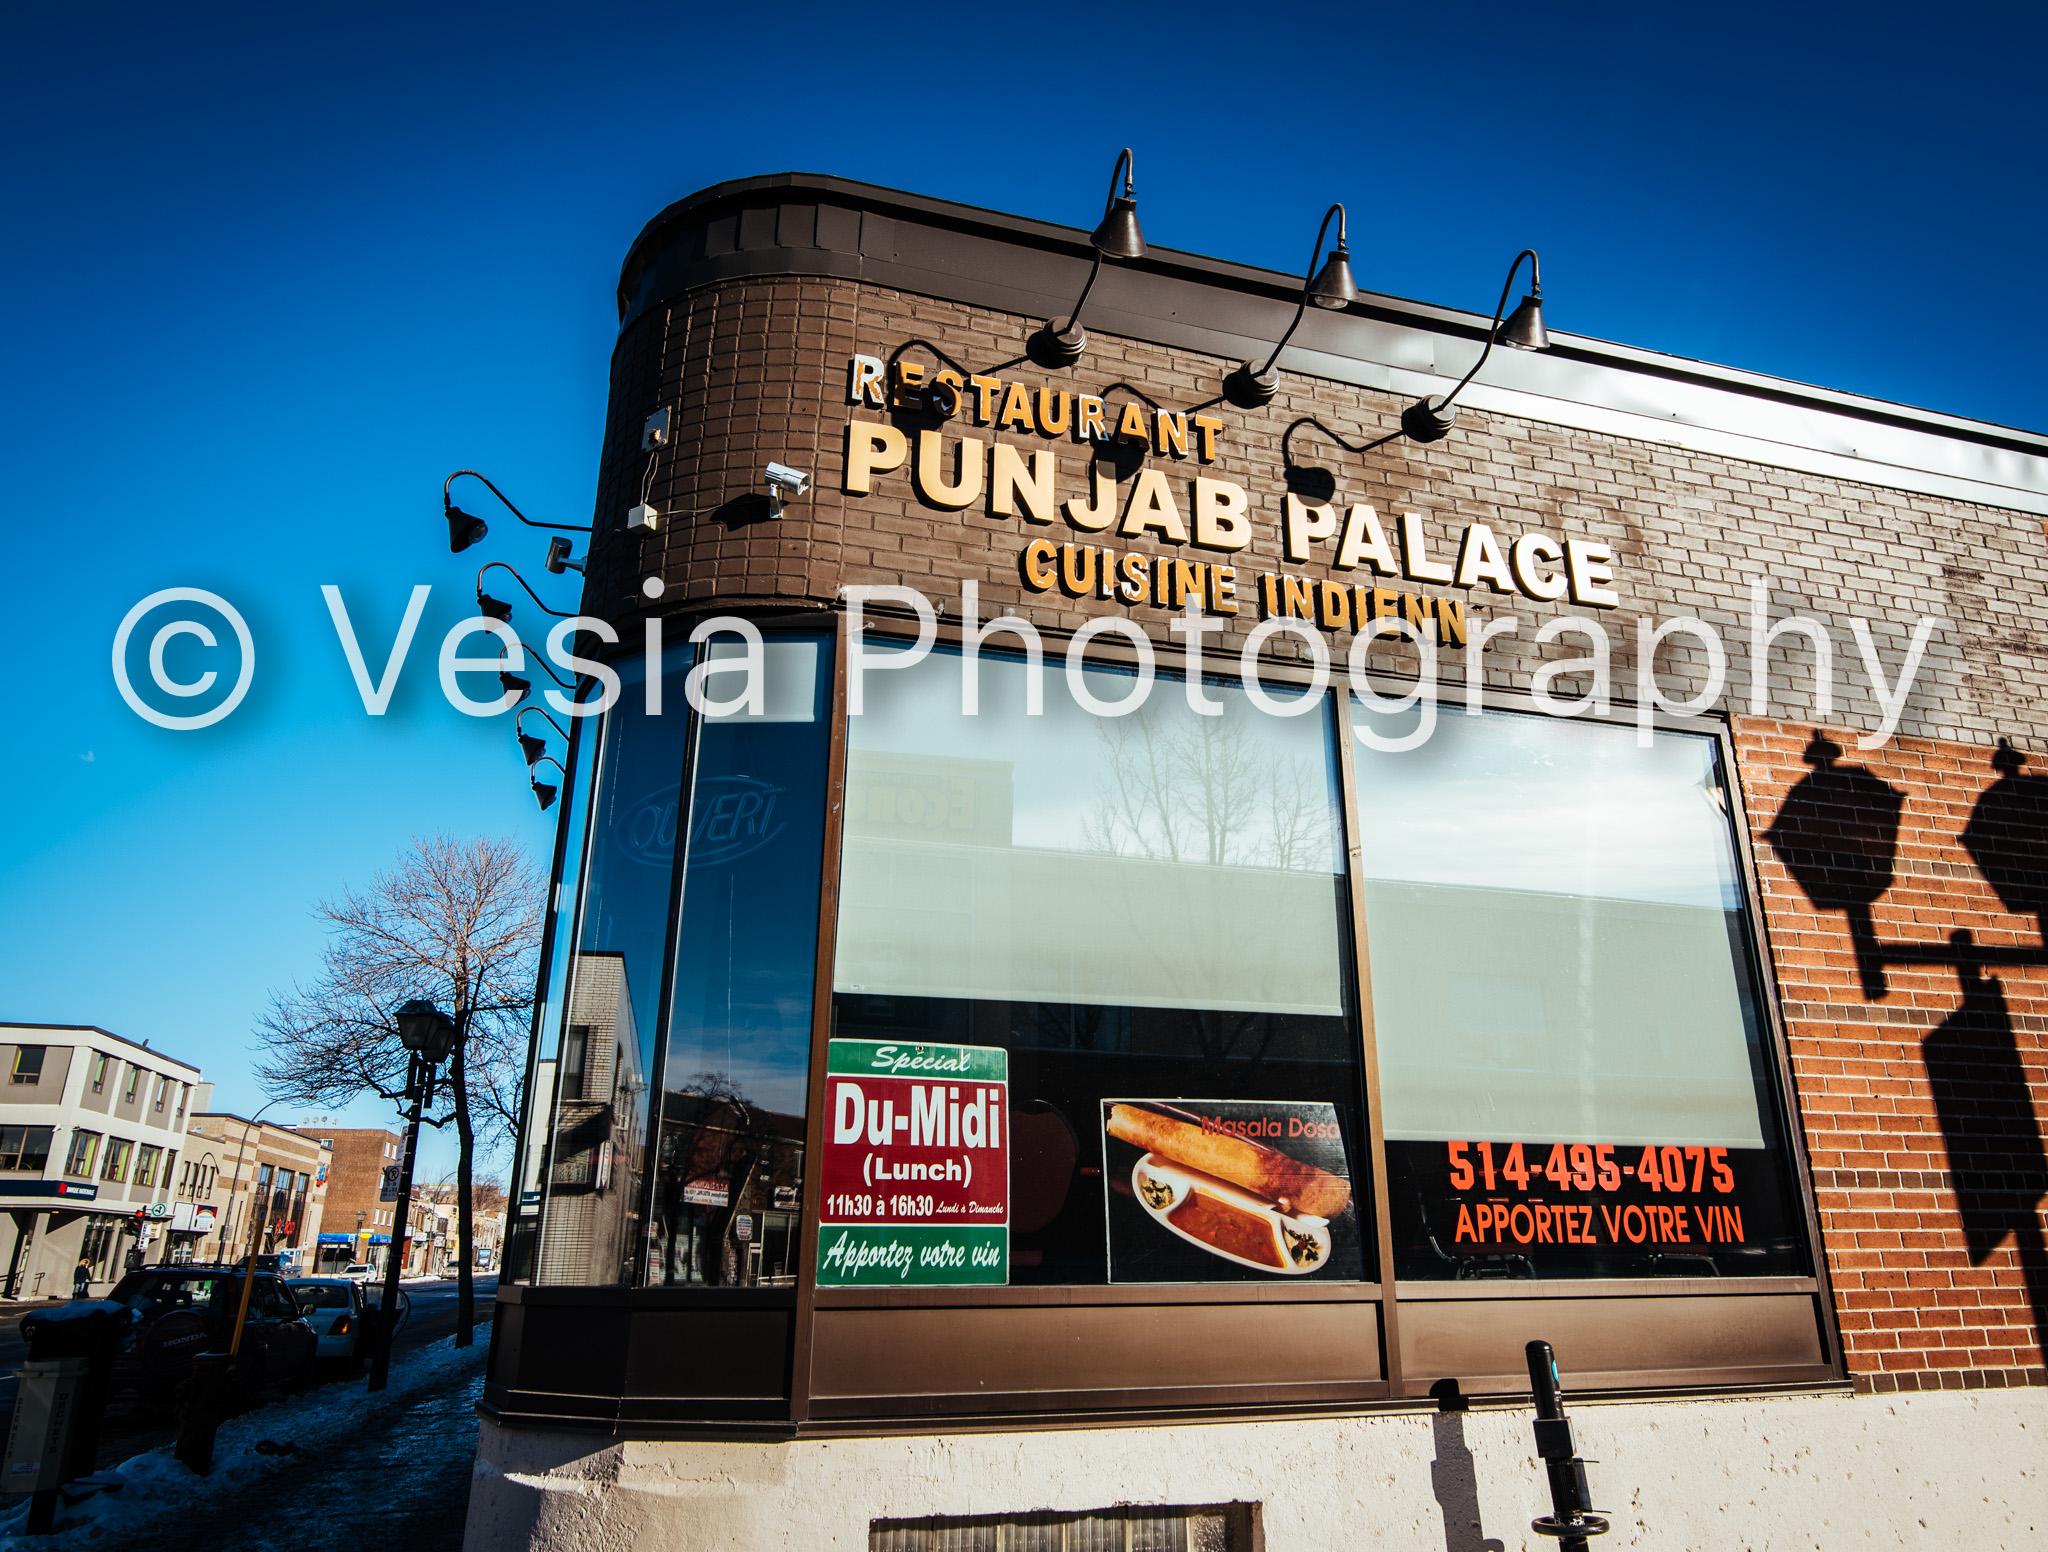 Punjab Palace_Proofs-1.jpg